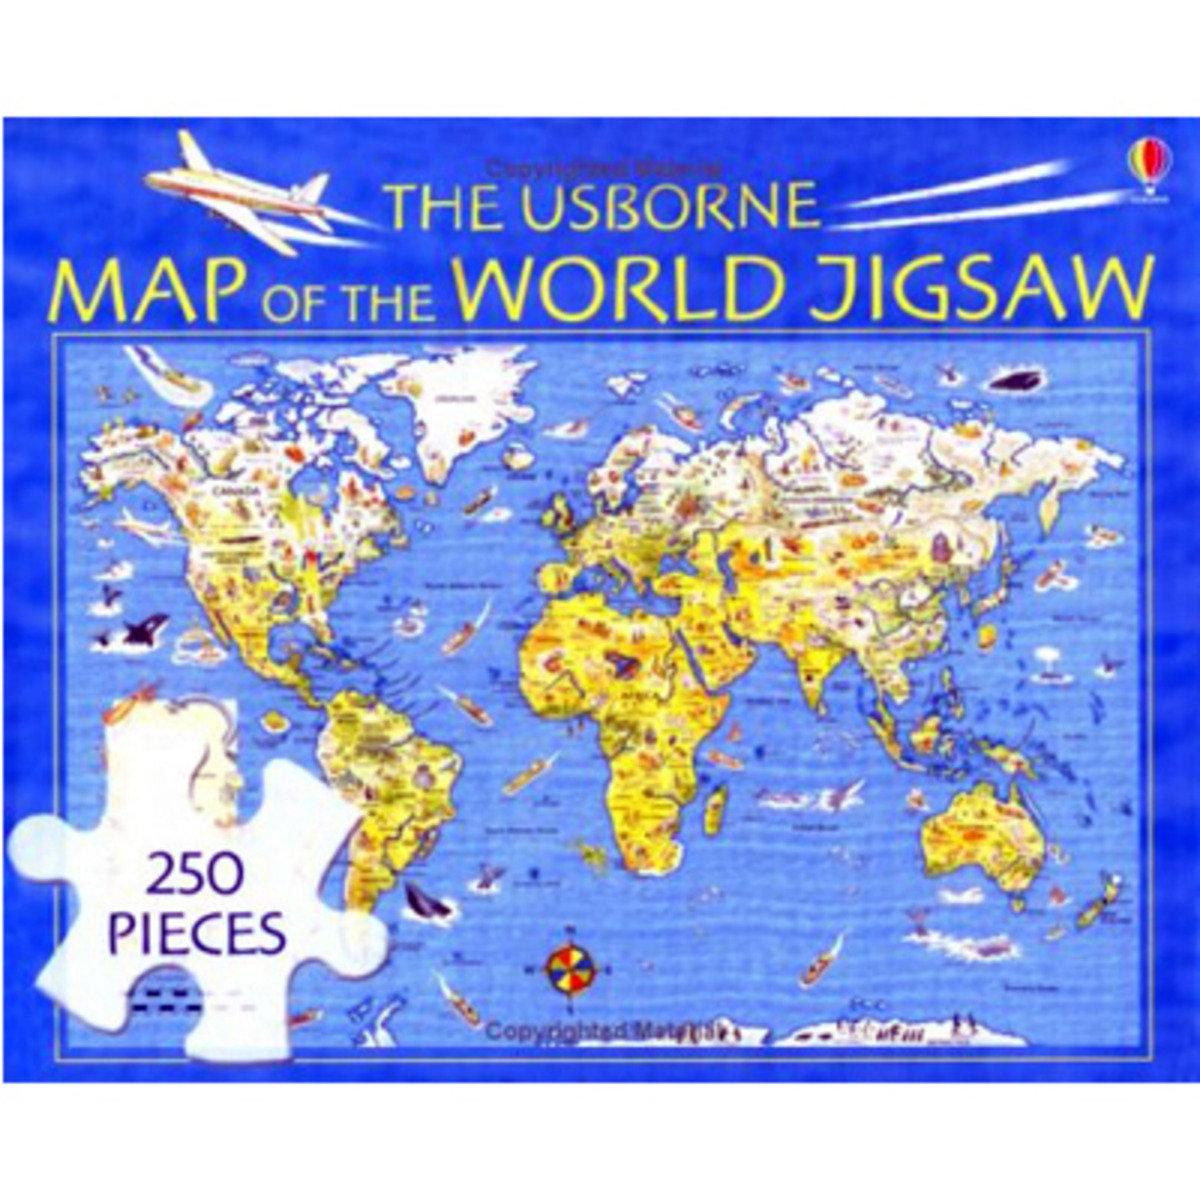 Usborne Map of the World Jigsaw